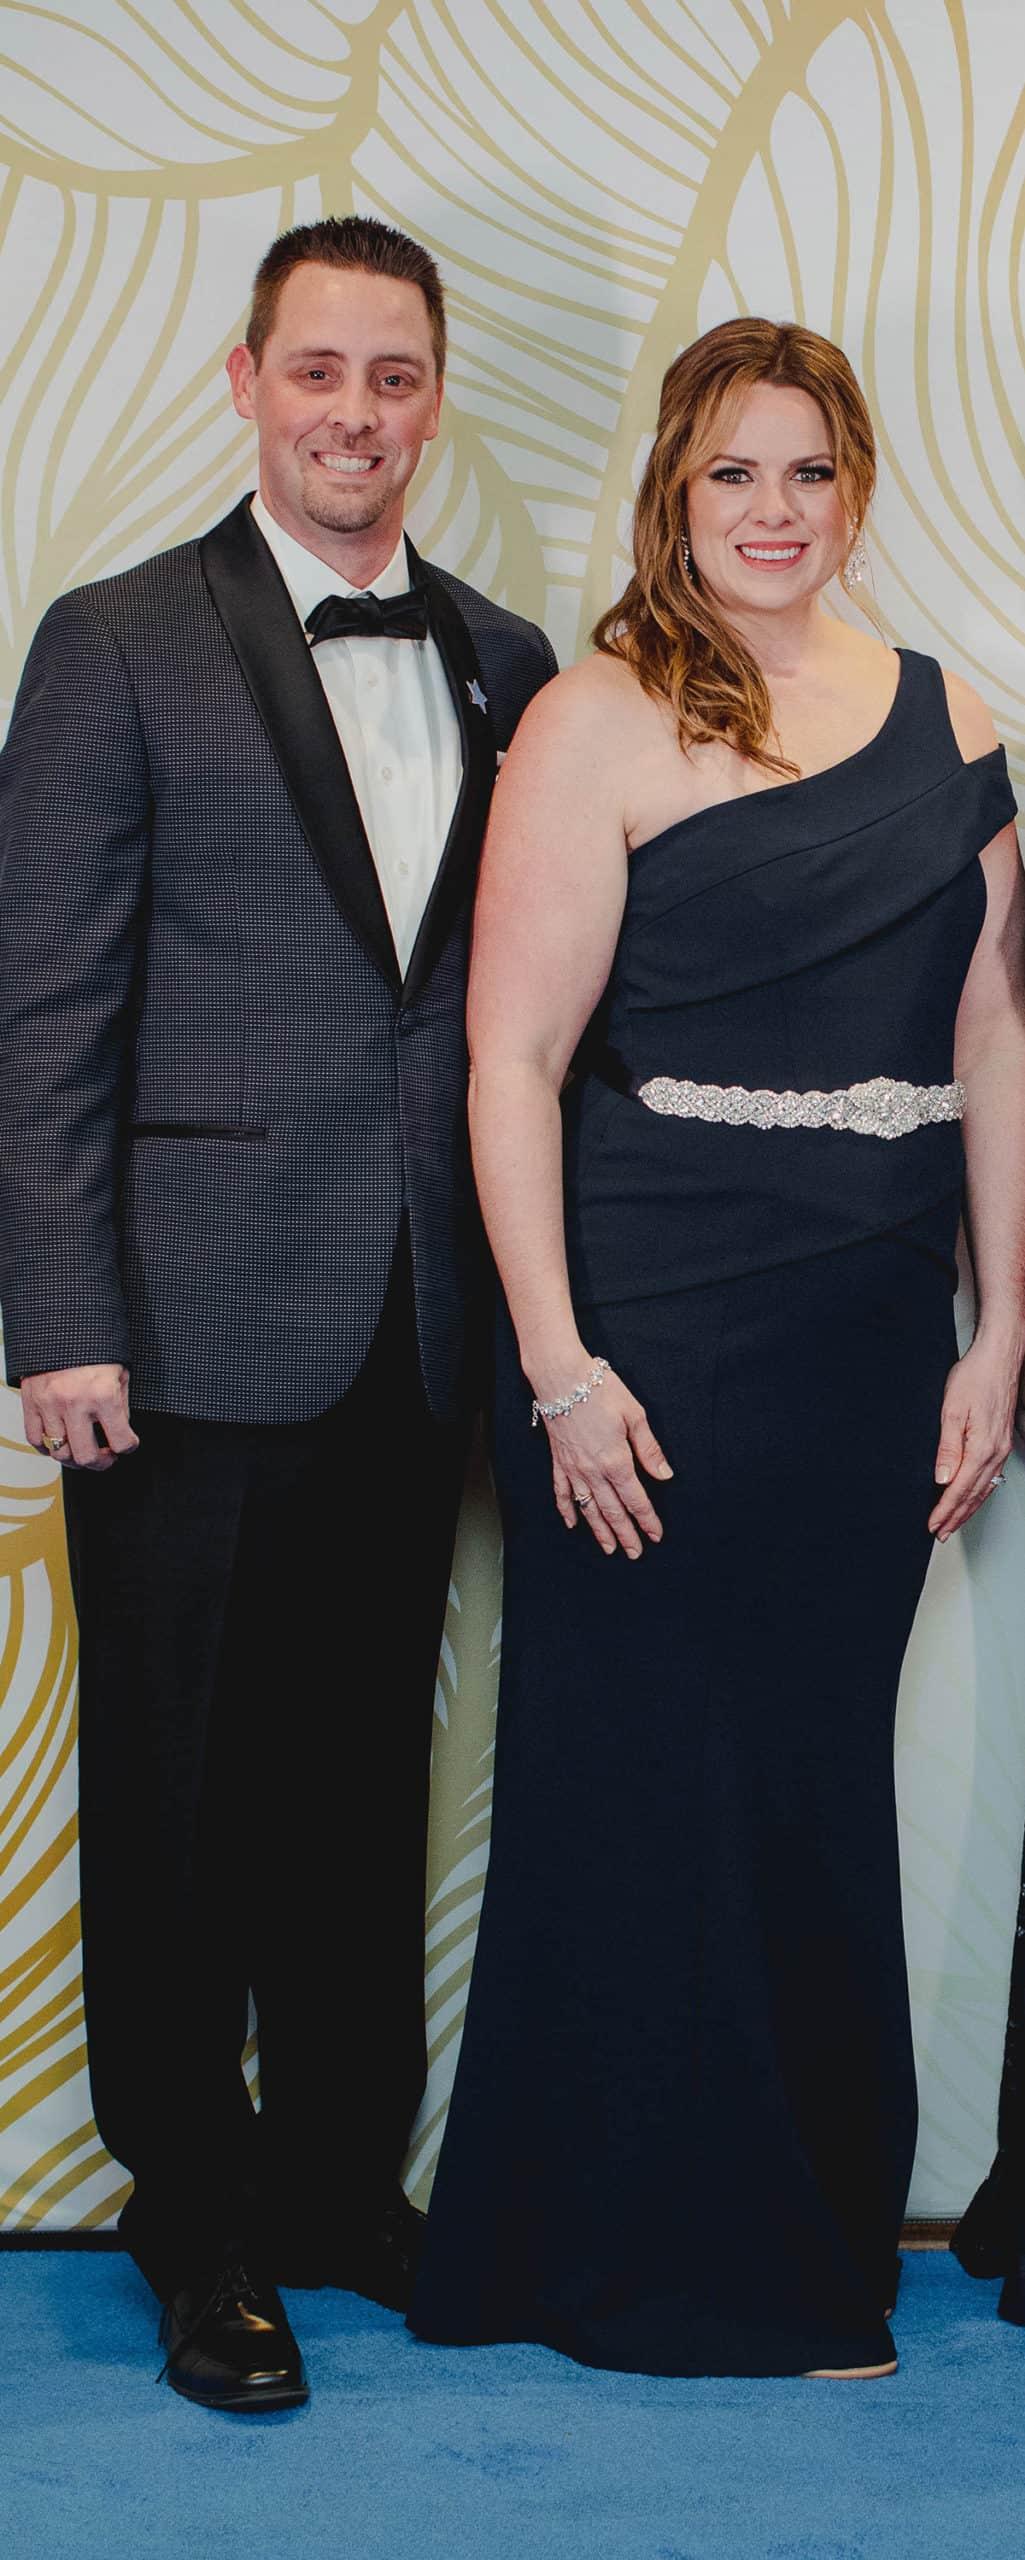 Anthony and Jennifer Schiavo